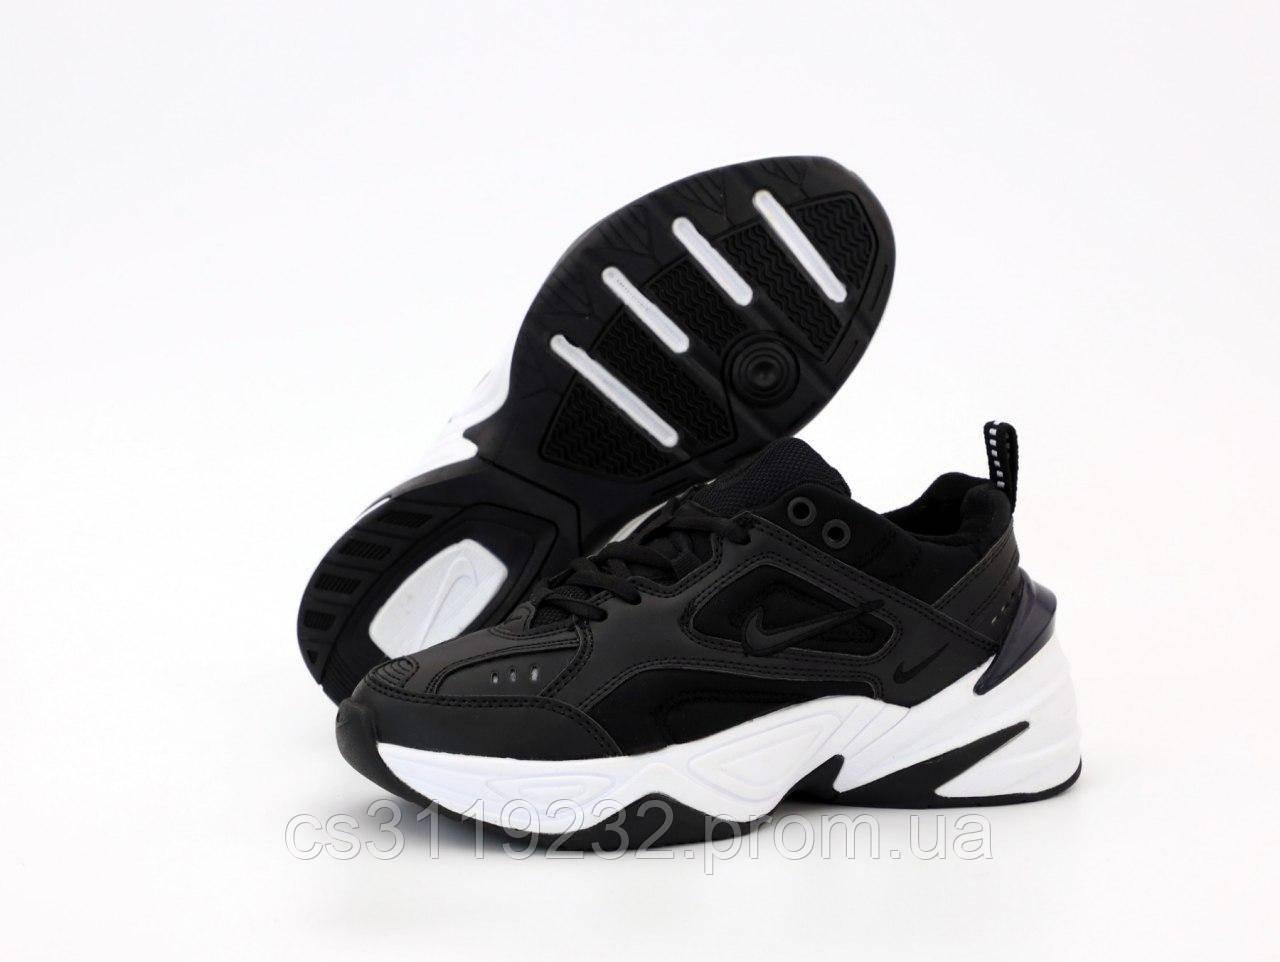 Женские кроссовки  Nike M2K Tekno Black White (черные)